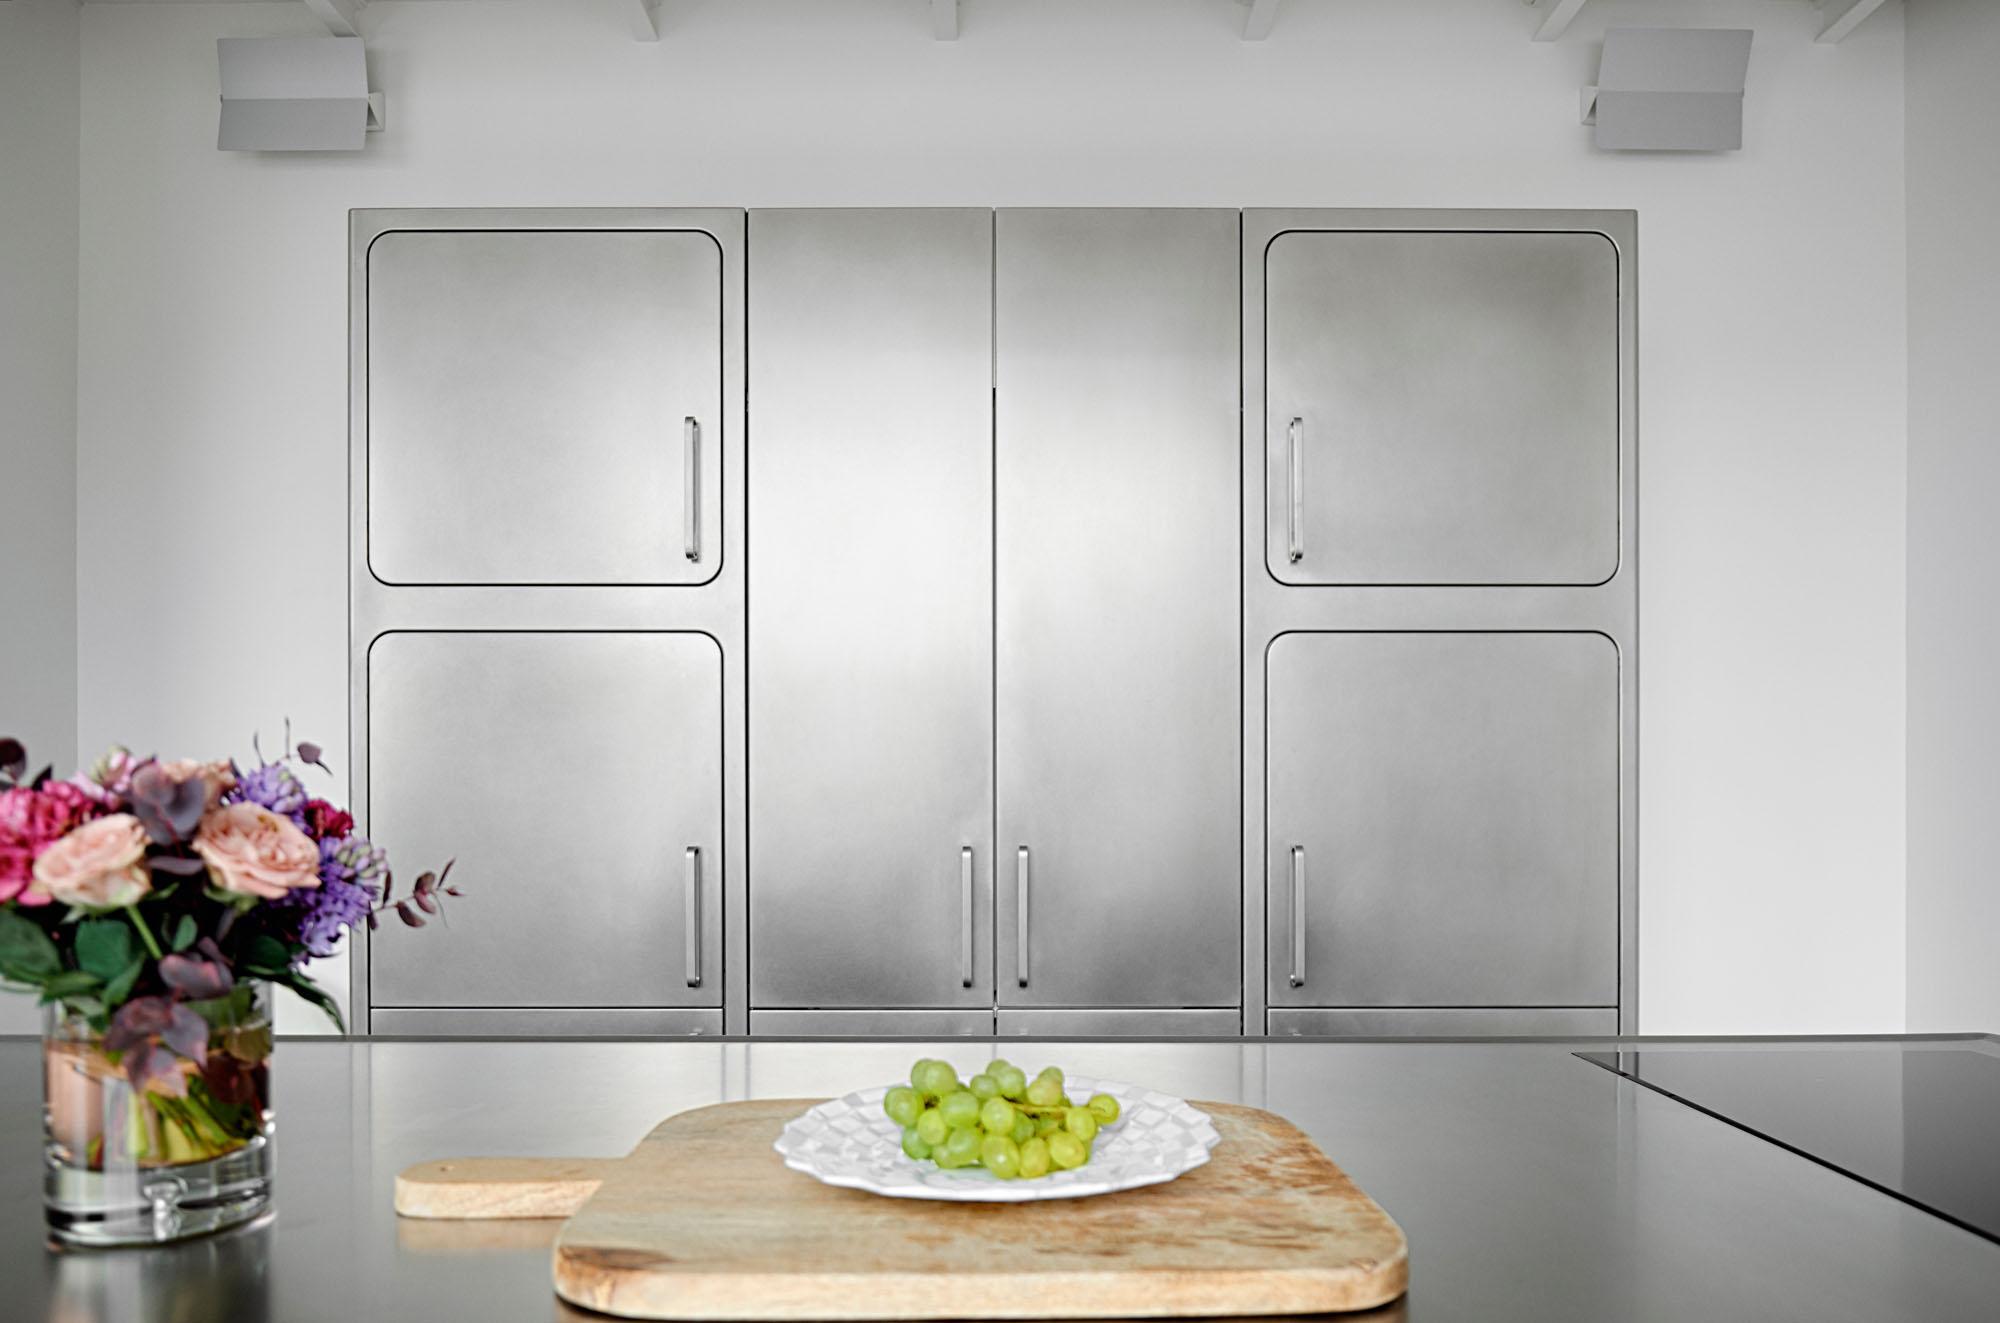 10 Alasan Kenapa Kitchen Set Aluminium Buat Kamu Lebih Untung